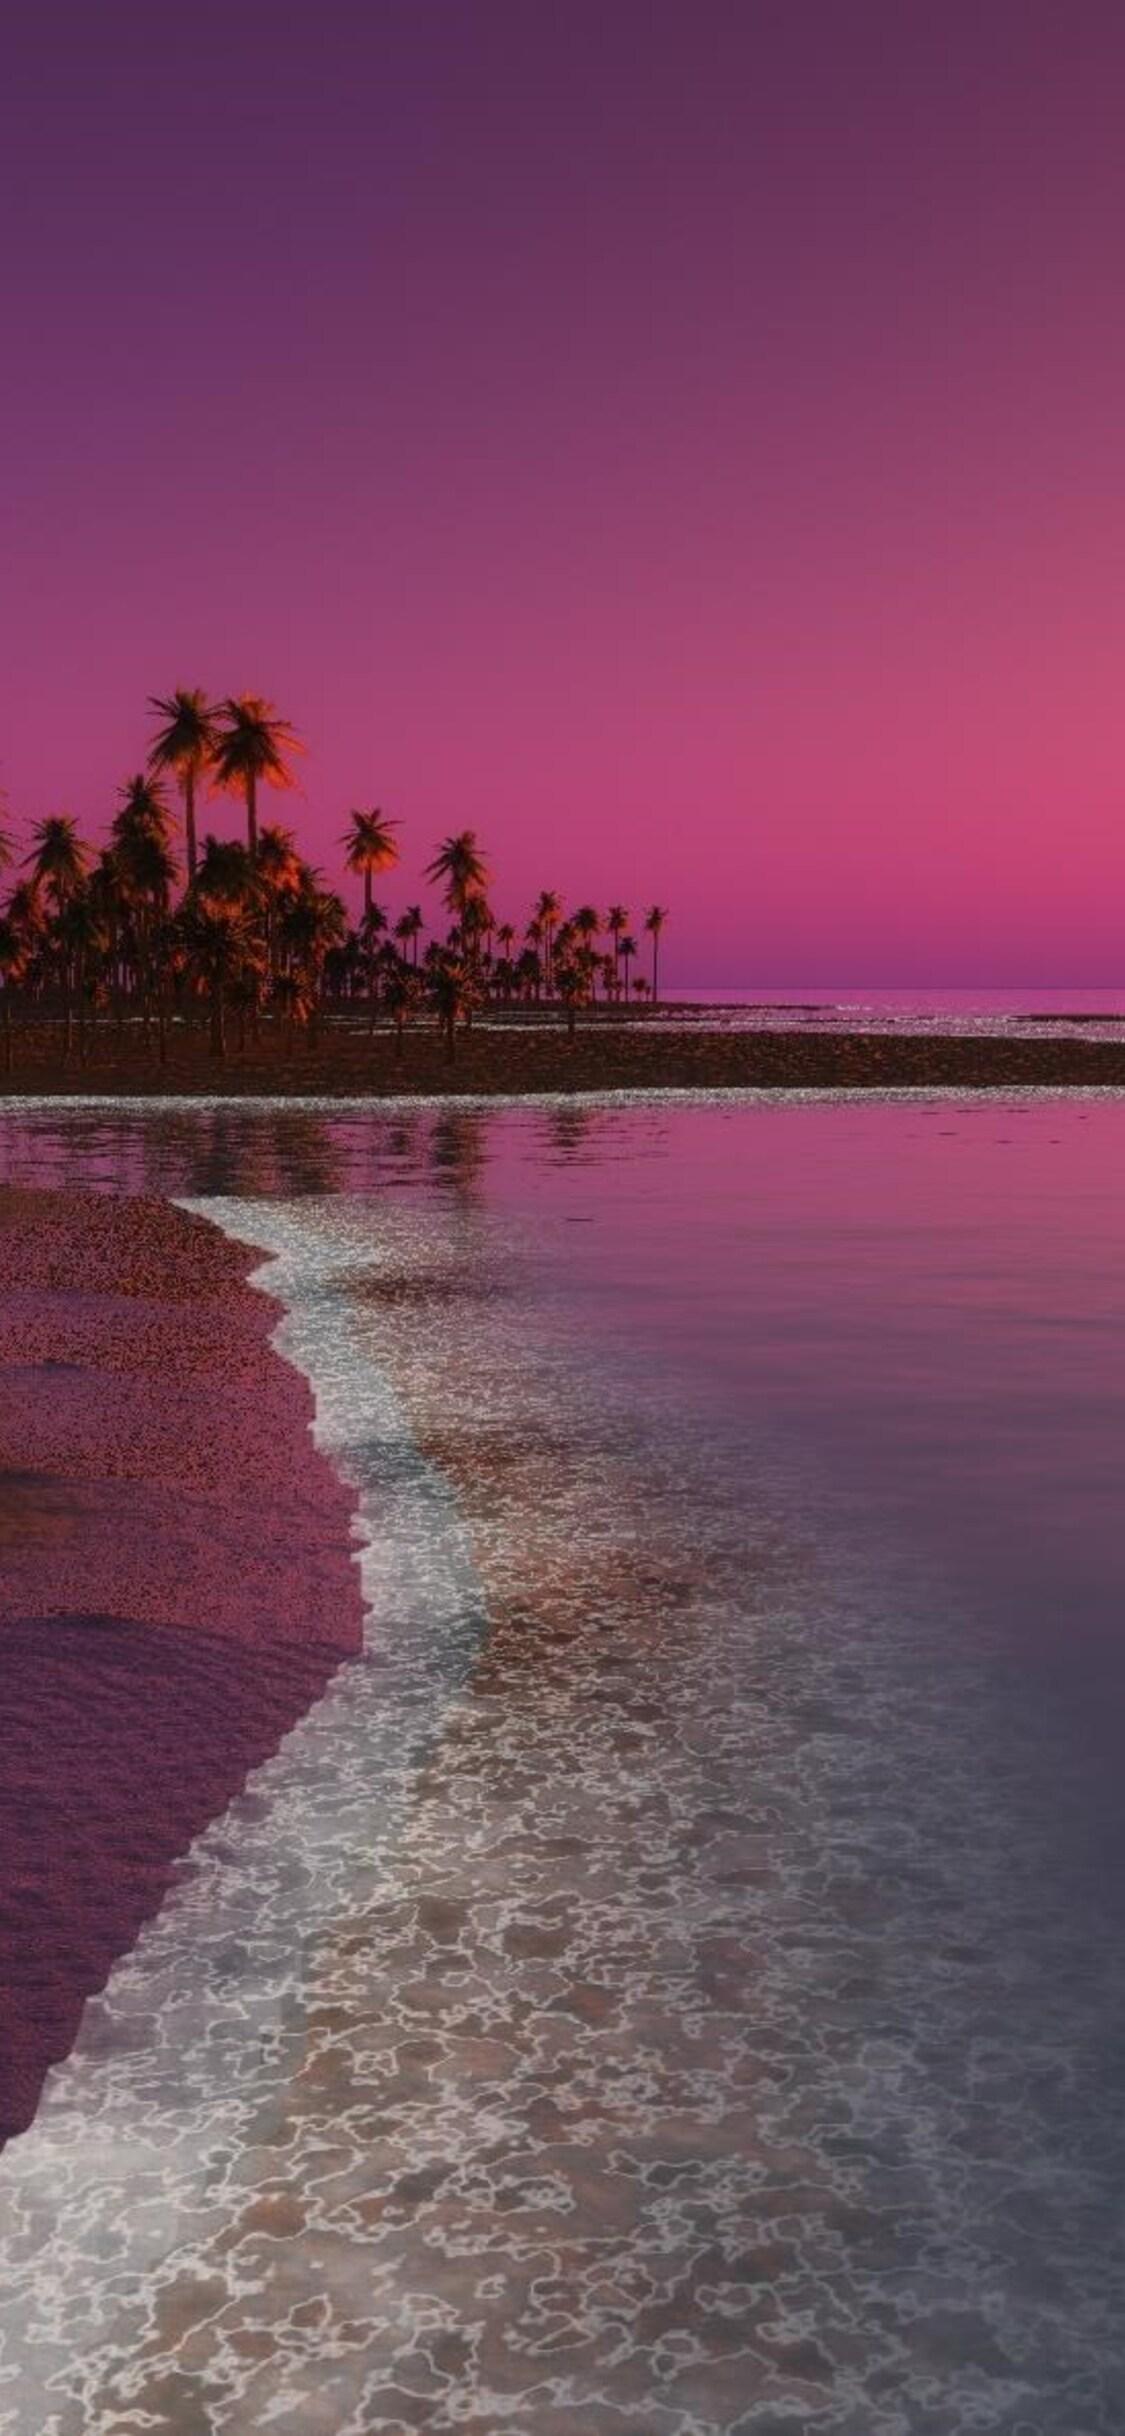 1125x2436 Digital Coastal Beach Sunset Iphone Xs Iphone 10 Iphone X